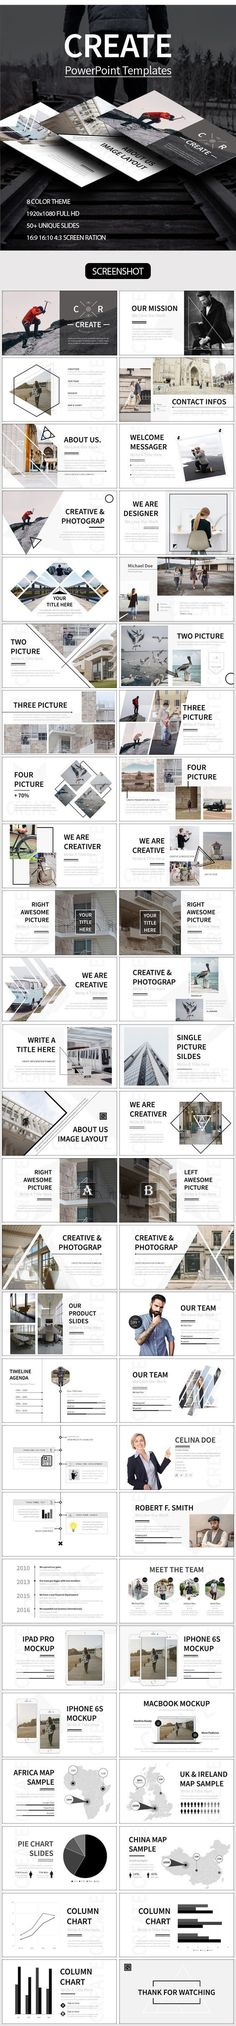 Great ebook design + best ebook design examples + head first design patterns pdf free download ebook + free ebook design templates + pdf ebook design + ebook layout design + ebook layout + interior layout + ebook interior layout + pdf design + ebook formatting